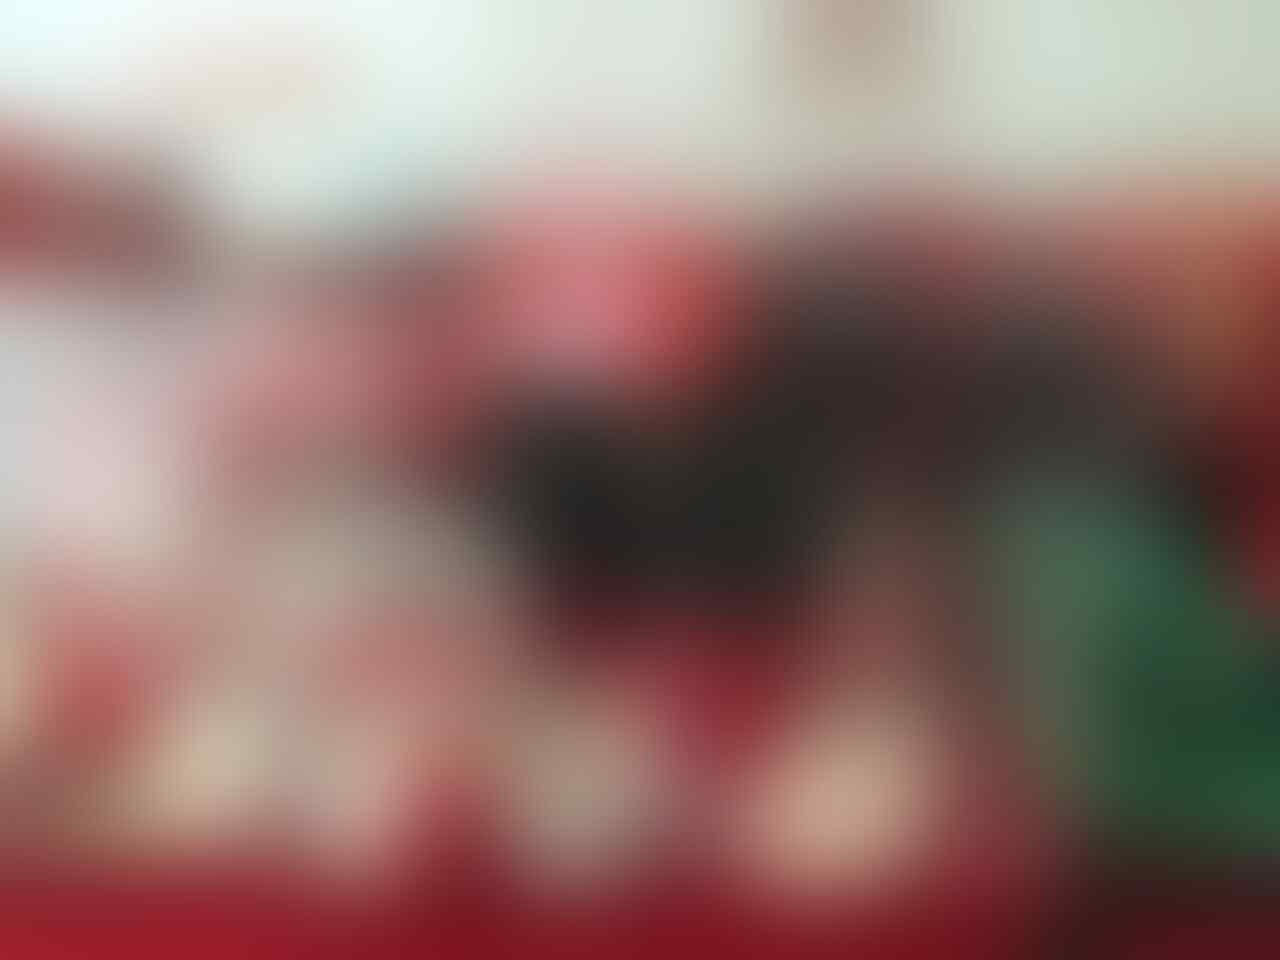 [Sewa / Jual] Kotak Acrylic Untuk Seserahan / Kotak Sangjit / Display Pajangan